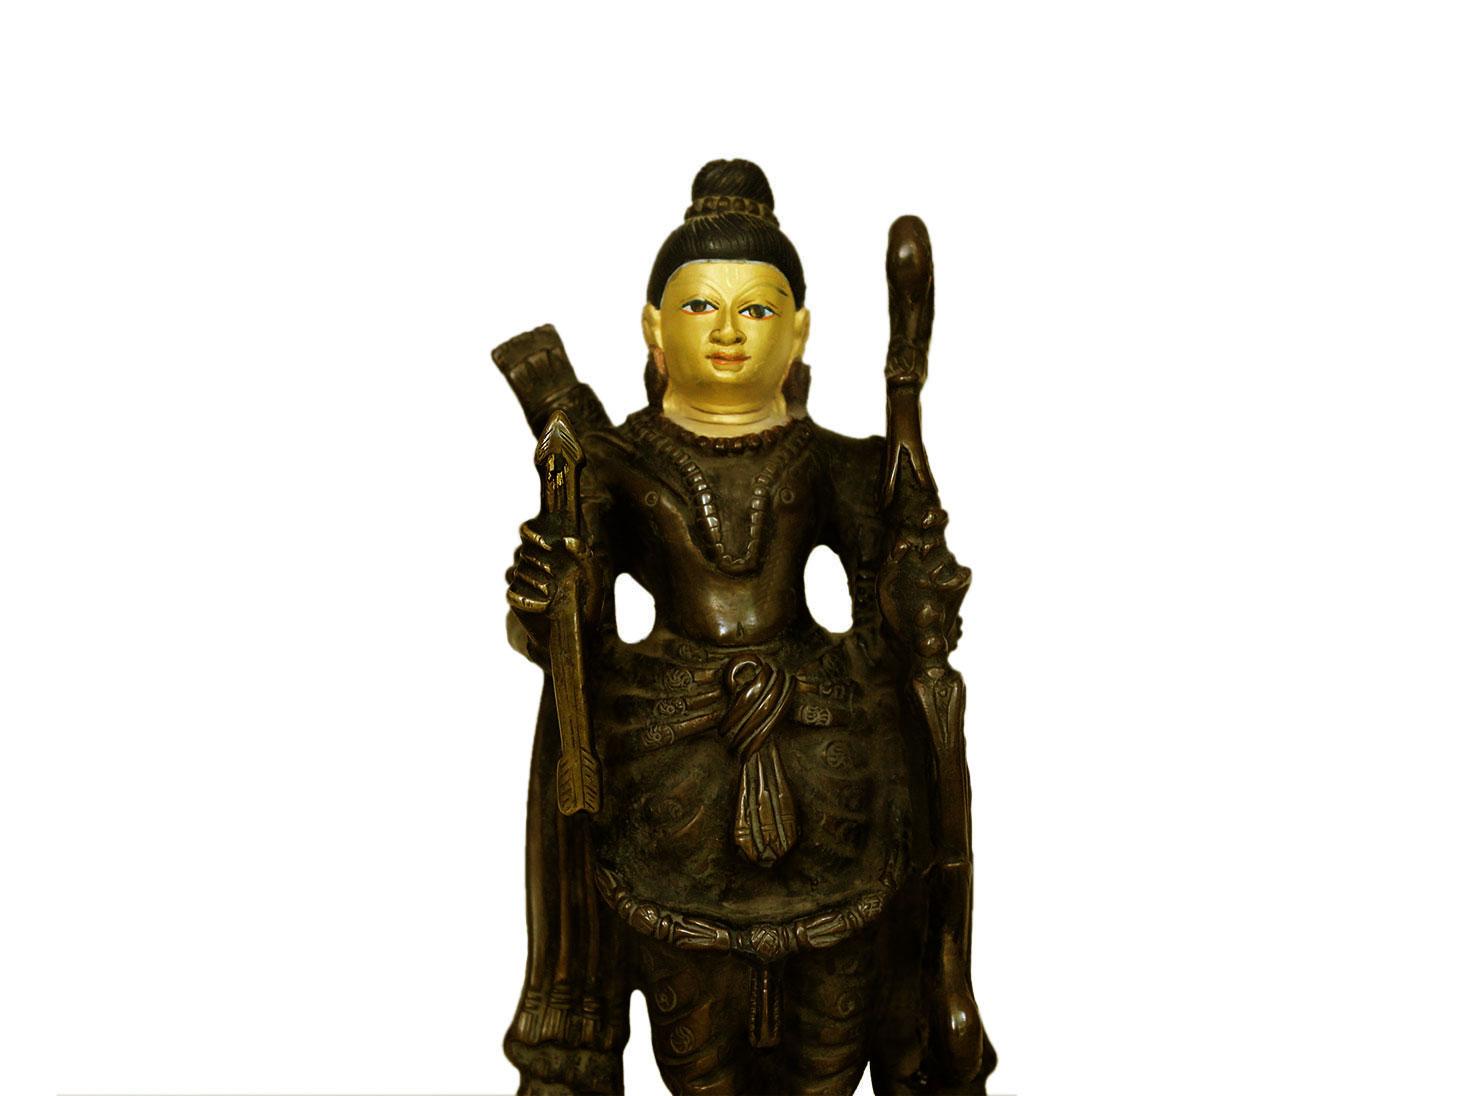 Brass Ram (Ht-7.9 Inches)